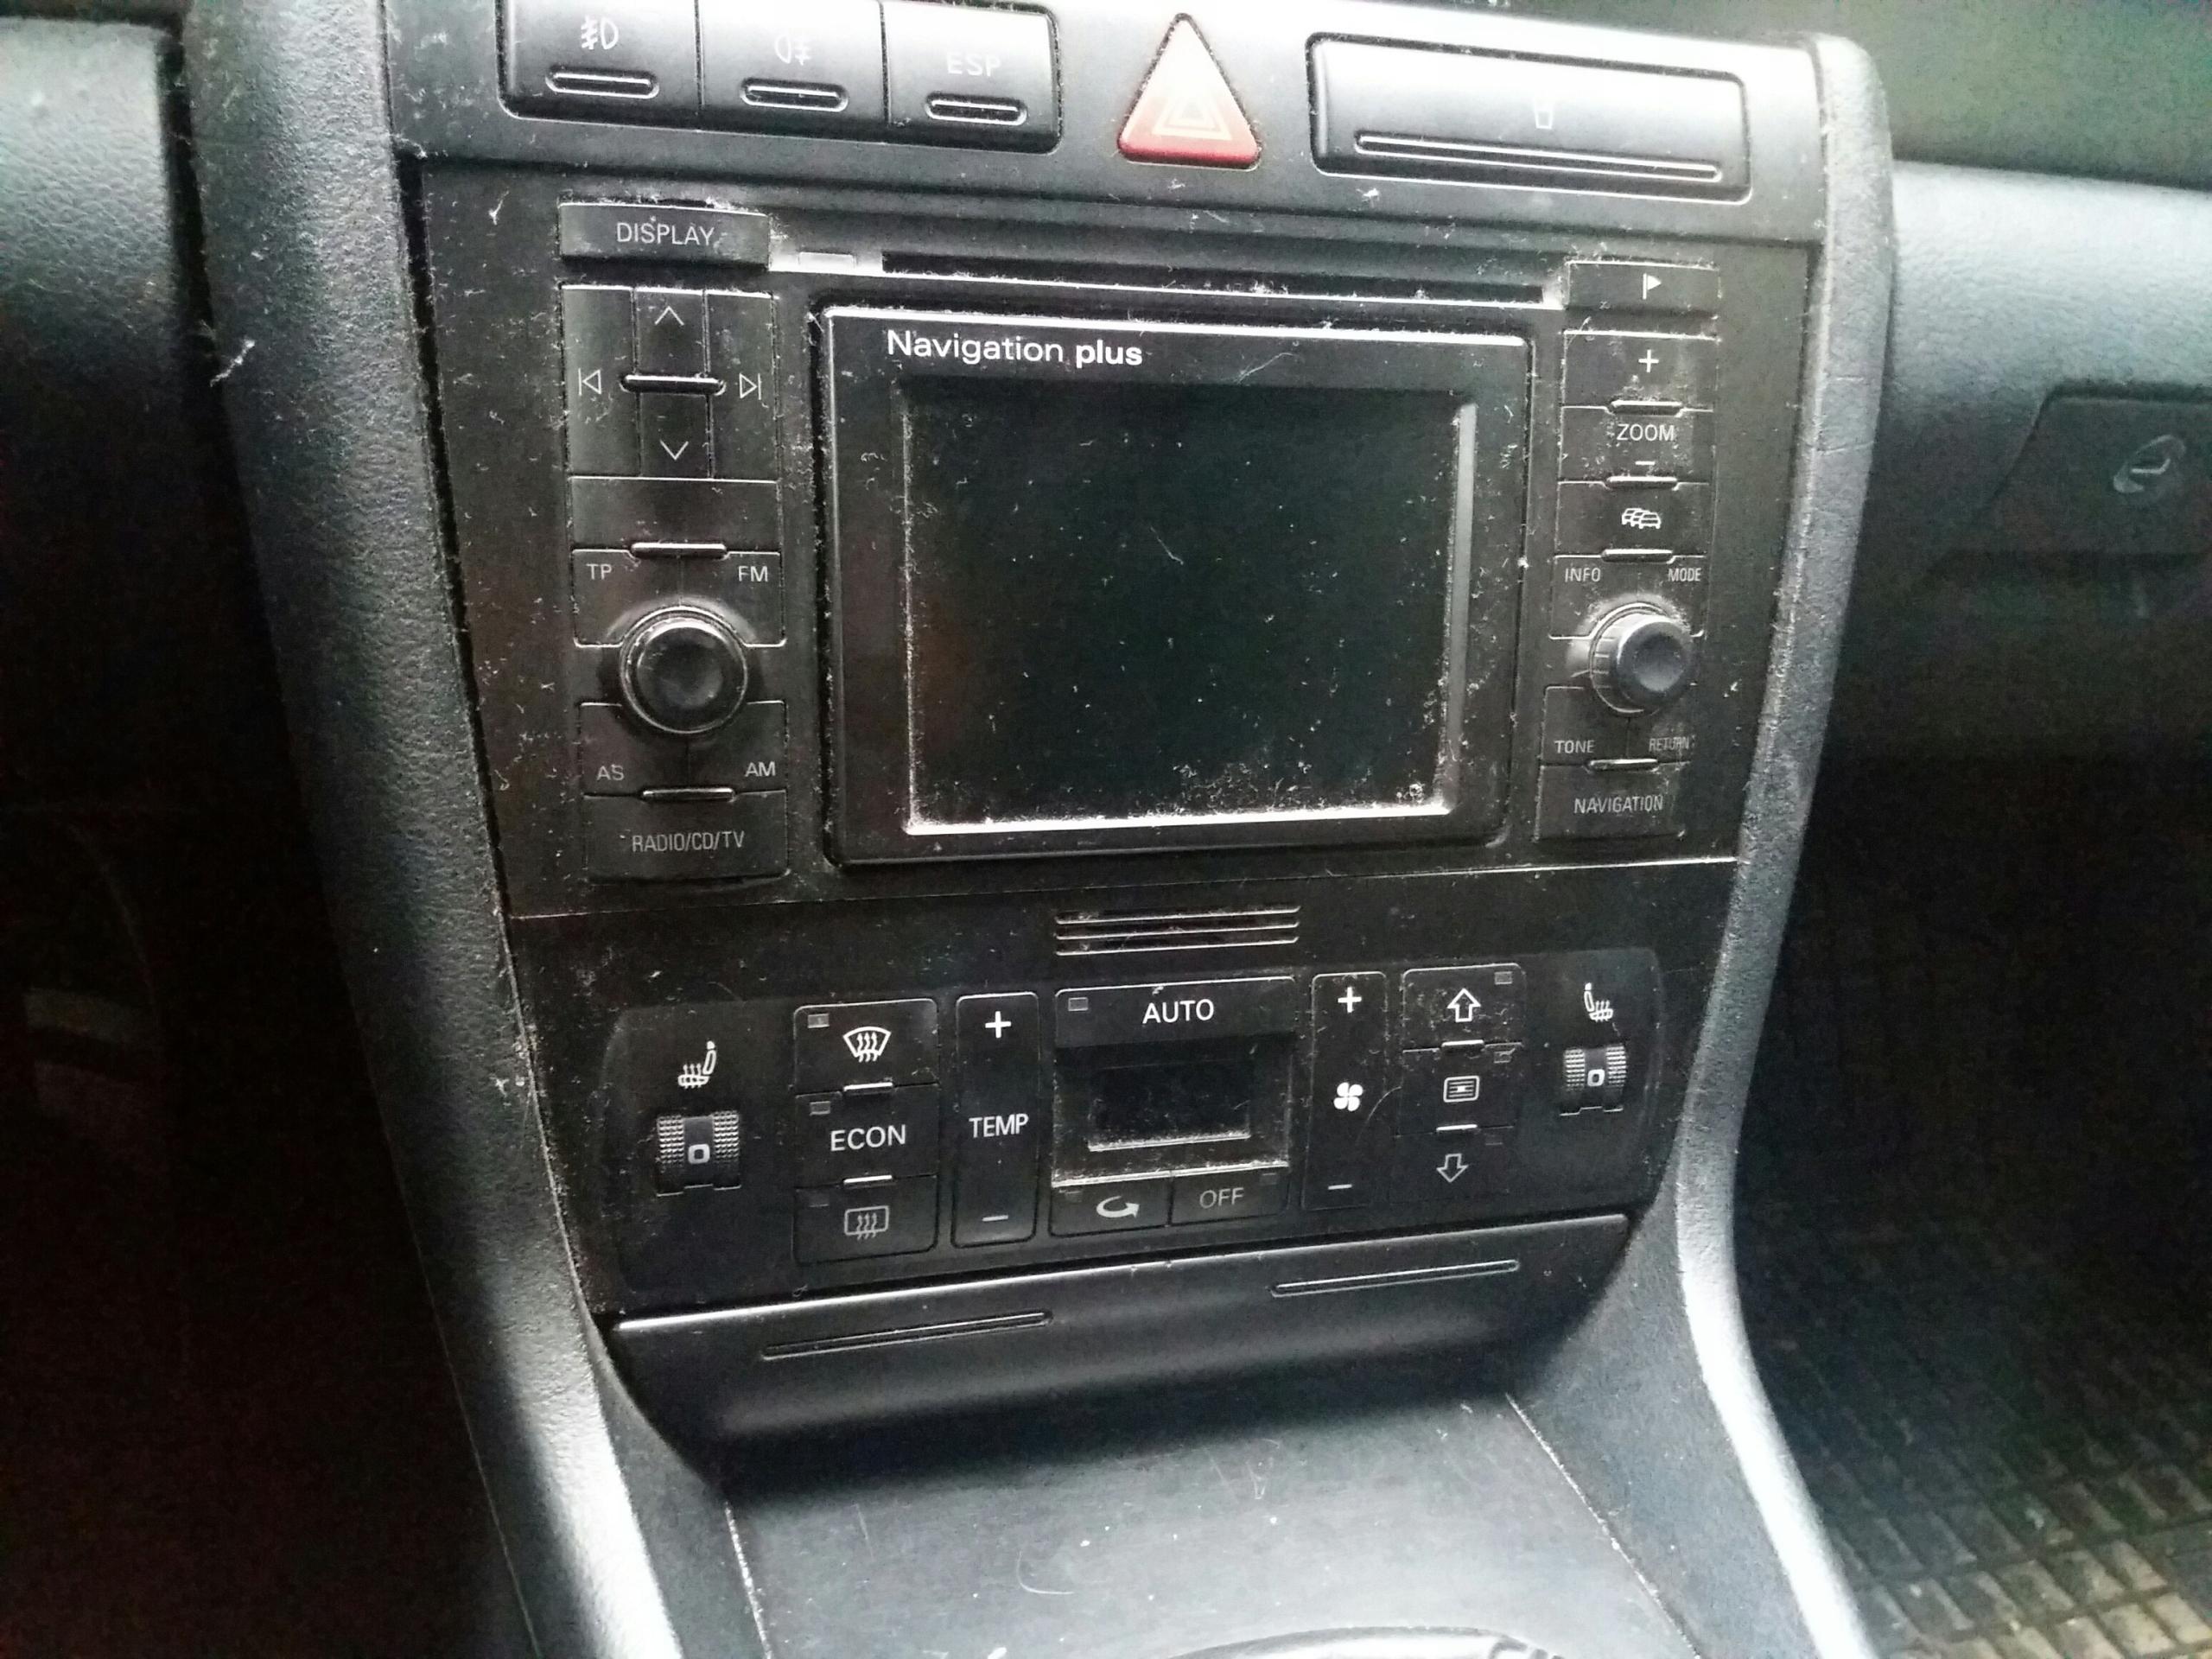 Radio Audi A4 B5 Navi Plus Rns D Zestaw Do Montażu 7641299464